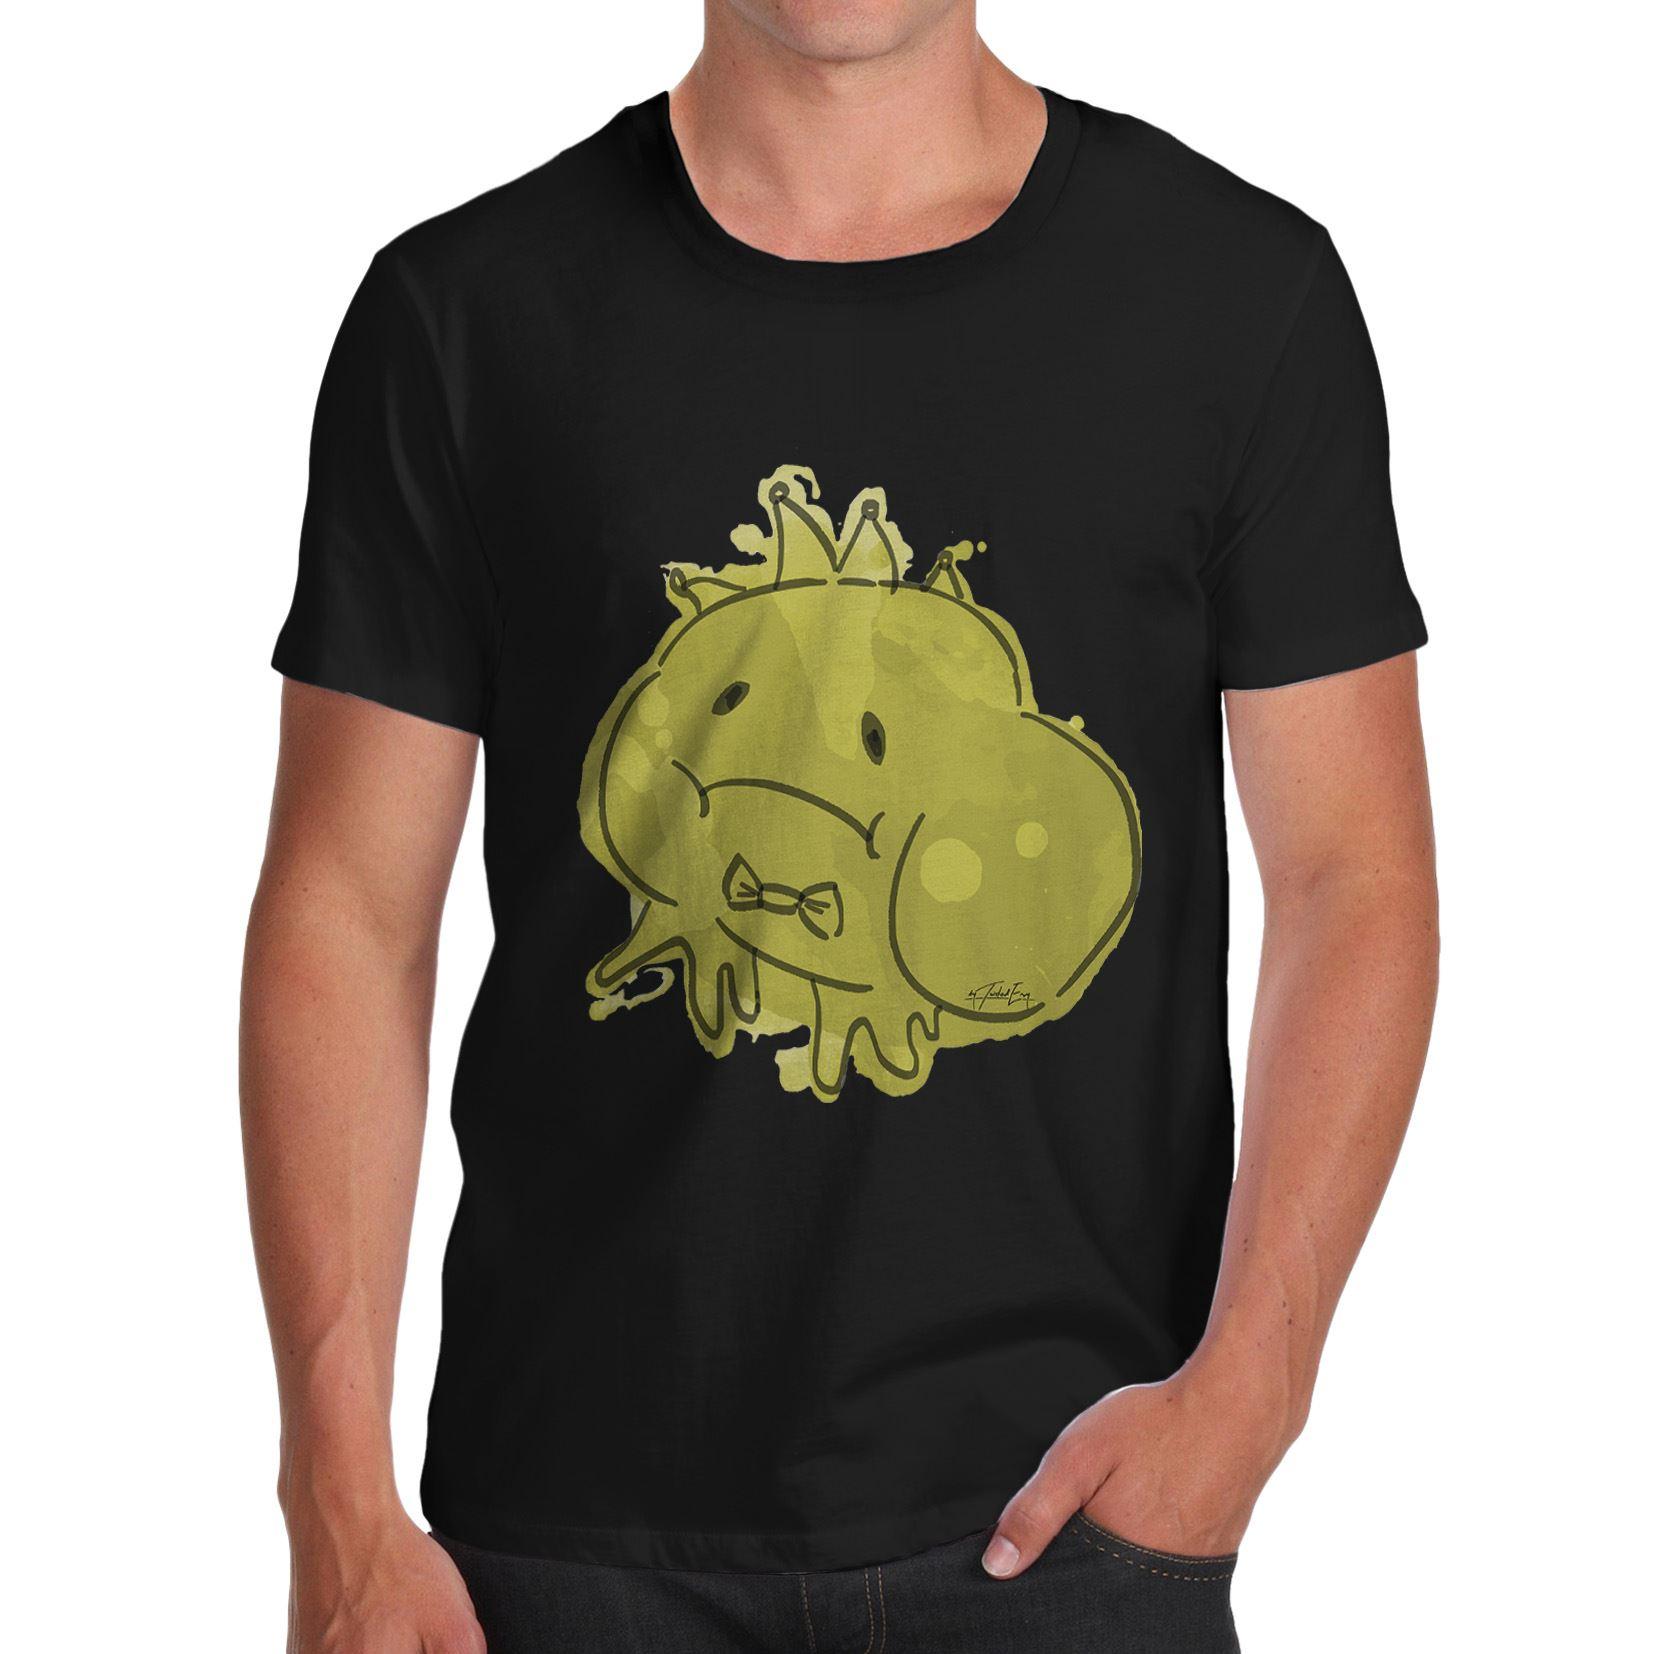 T shirt design uk cheap - Cool T Shirts Designs Best Selling Men Ink Splat Frog Prince T Shirt Cheap Sale 100